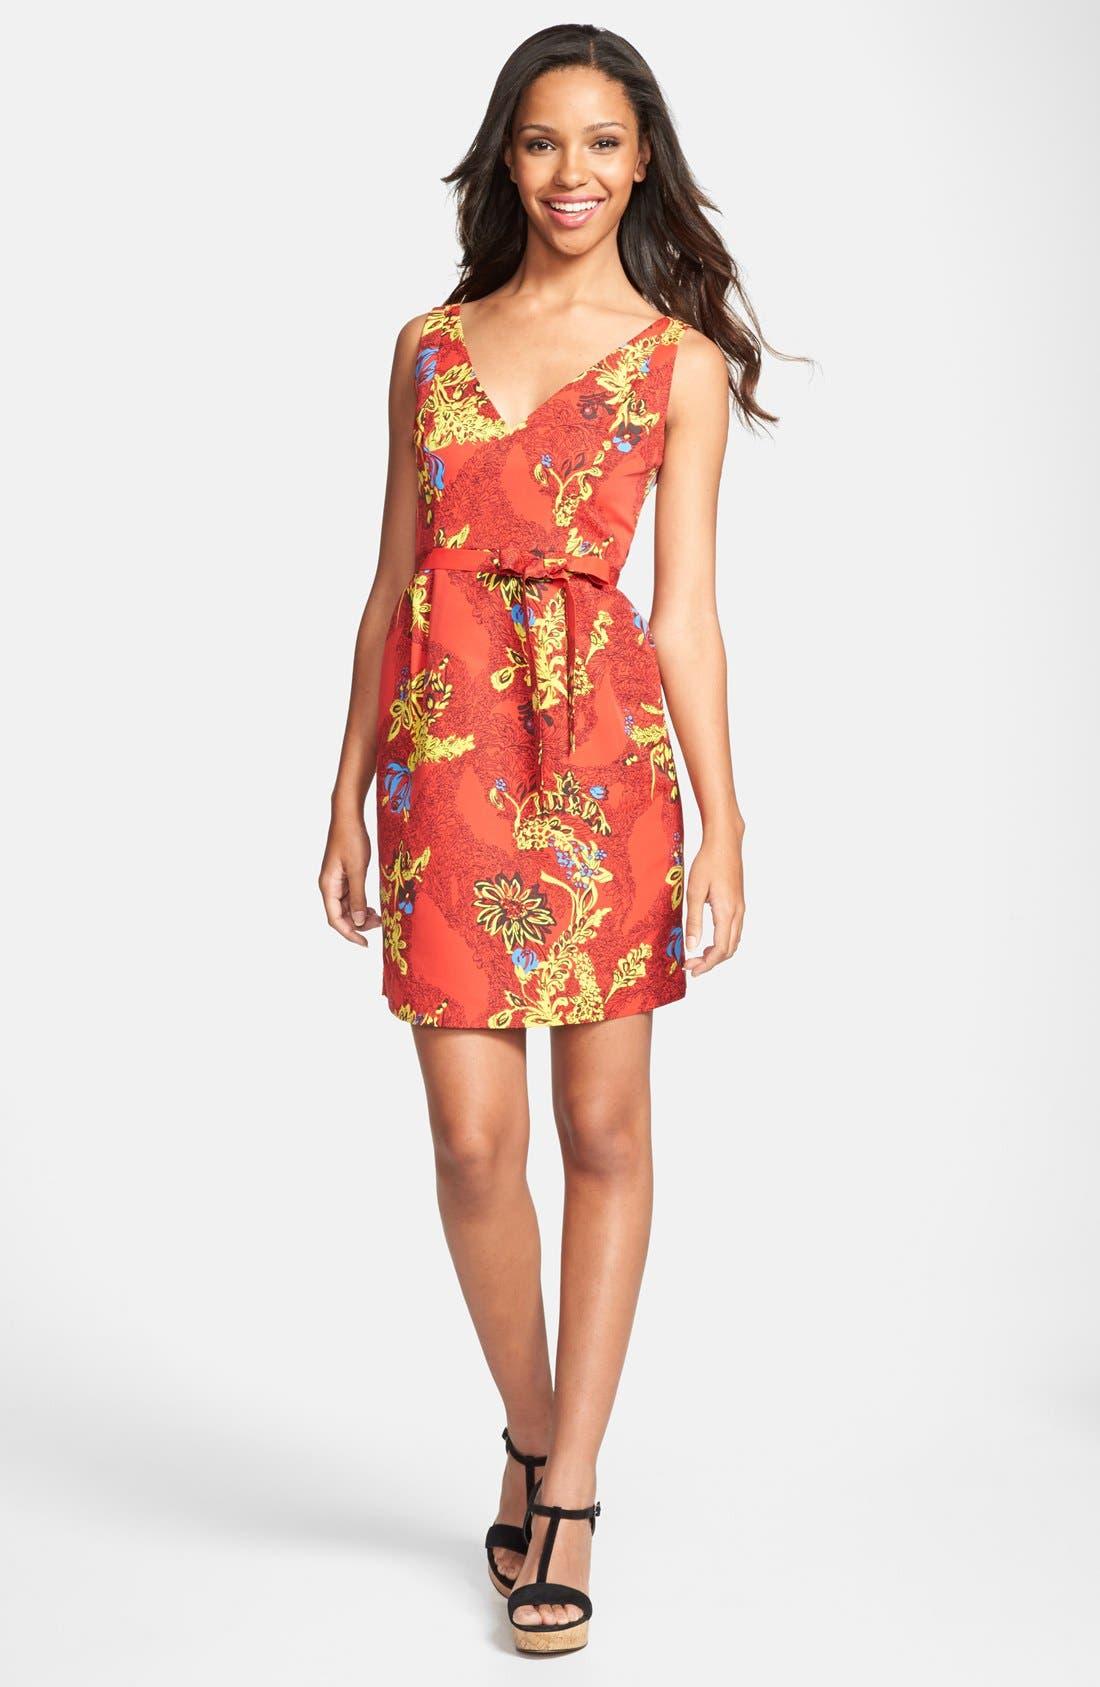 Alternate Image 1 Selected - Plenty by Tracy Reese 'Ashley' V-Neck Print Dress